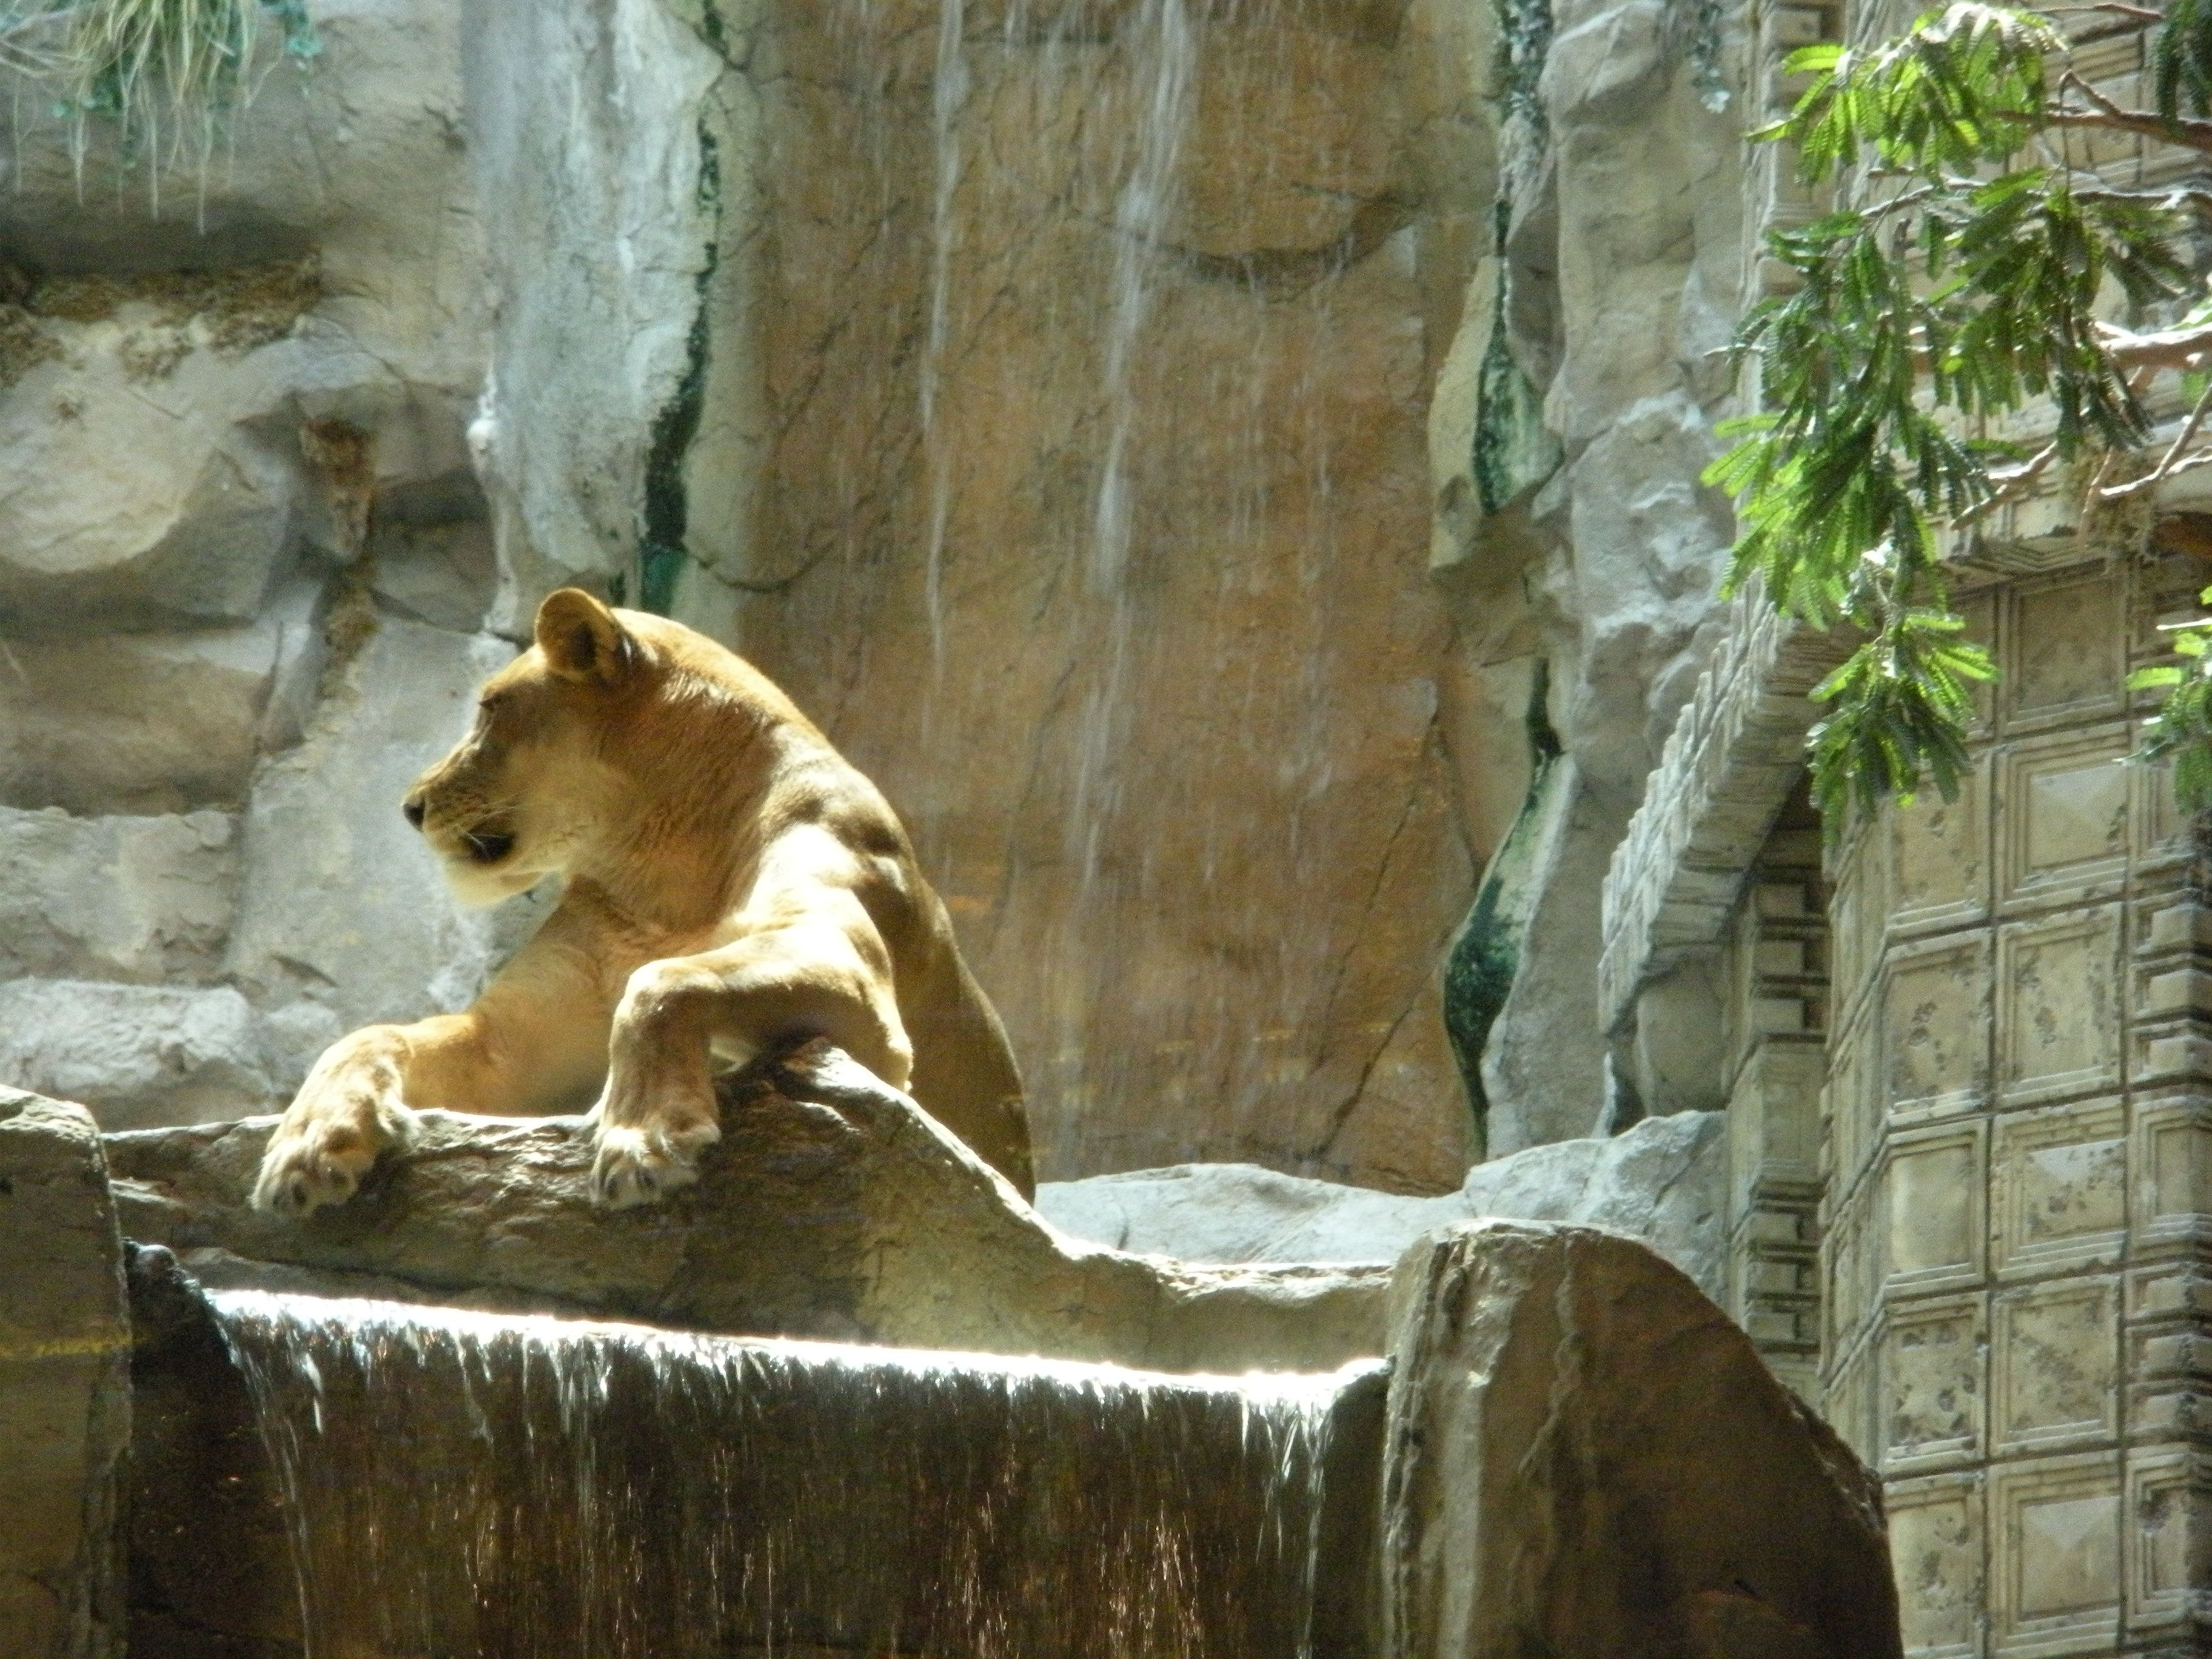 Visiting the Lions @ MGM Grand in Las Vegas | VIVA LAS VEGAS ...